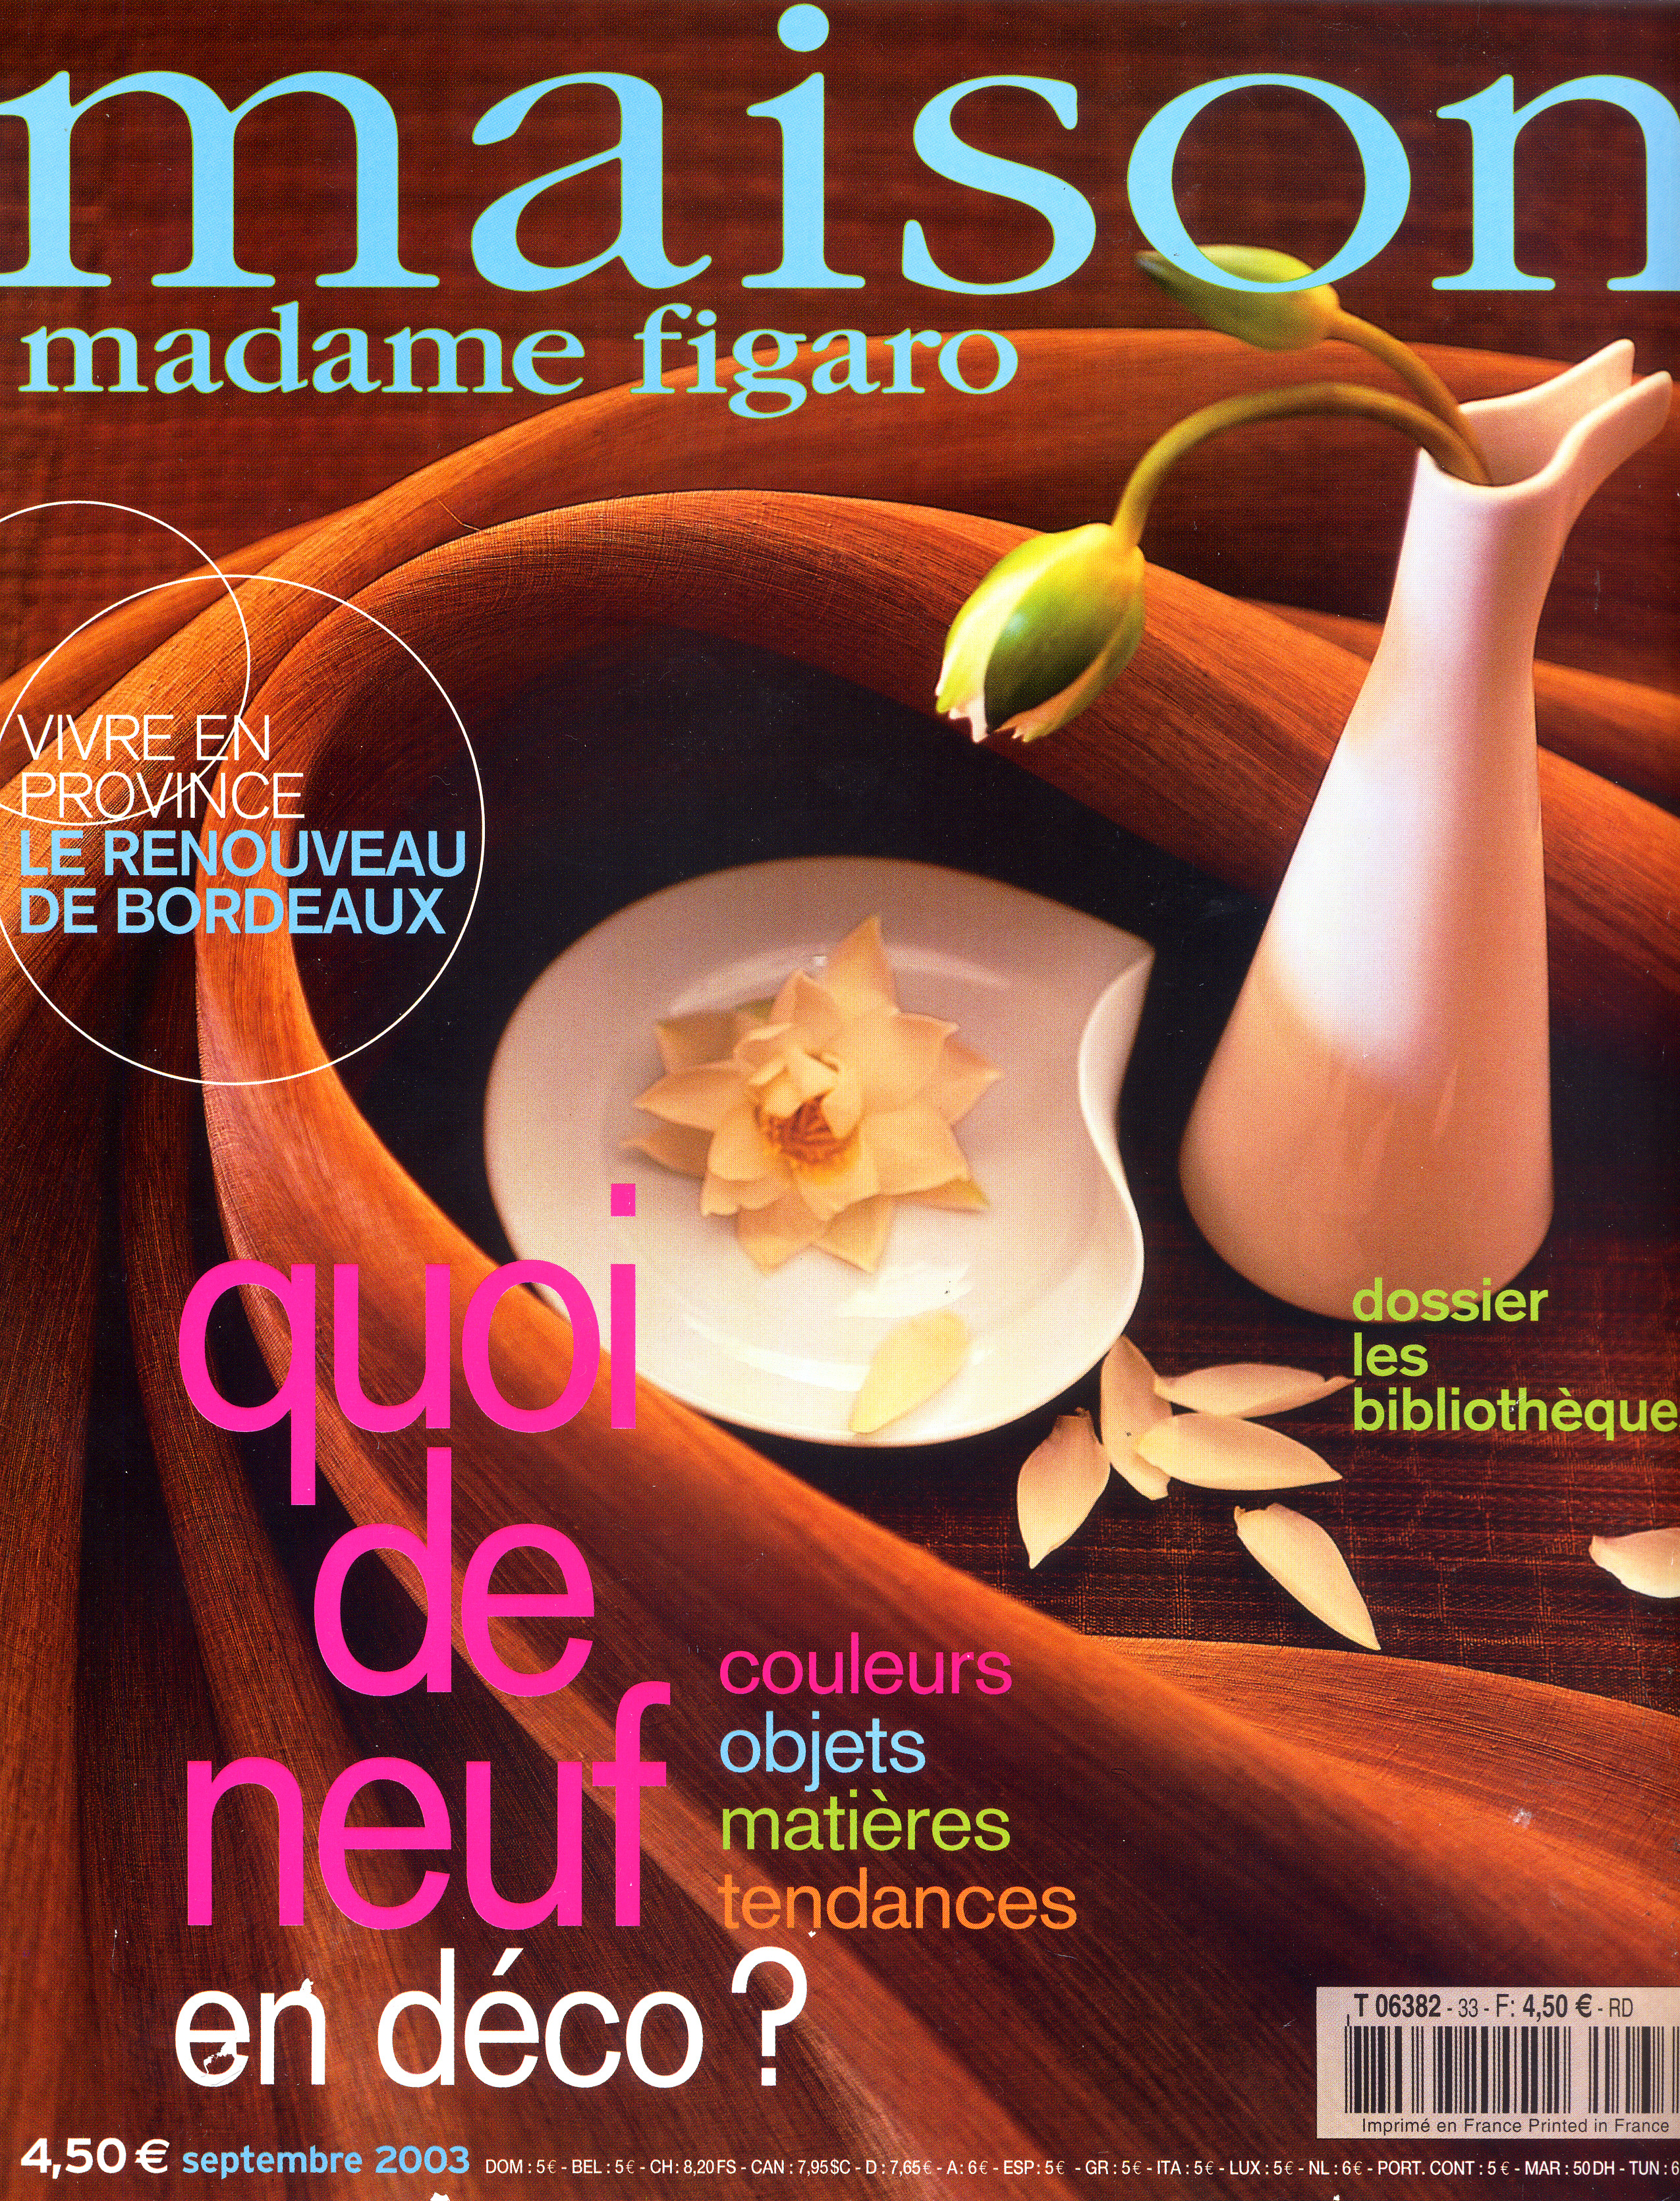 maison+madame+figaro+settembre03.JPG